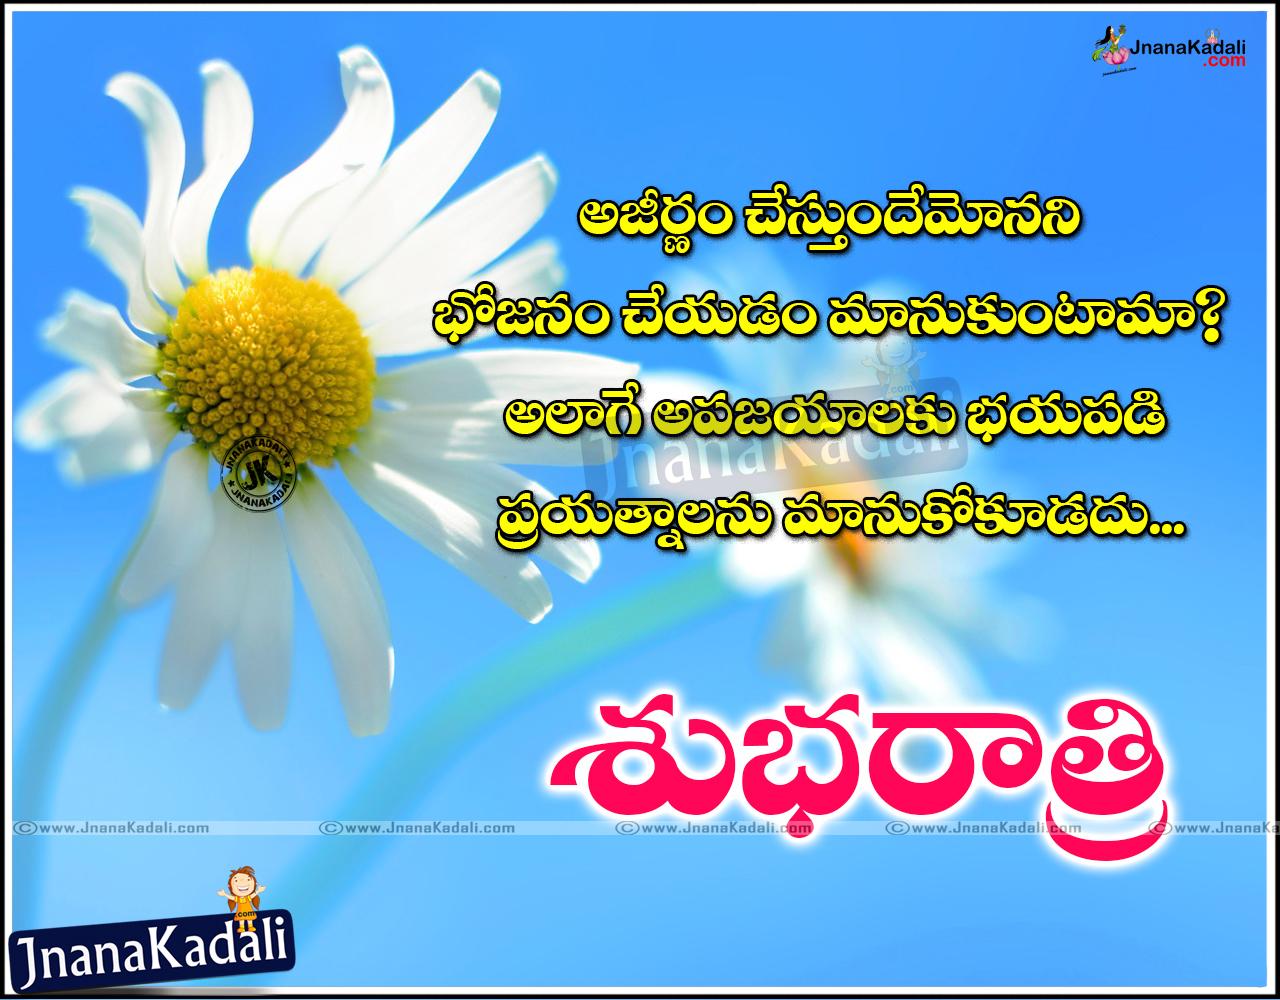 Telugu new good night greetings animated greeting cards online heart touching good night quotes in telugu jnana kadalicom best2bgood2bnight2bmessages ccuart Gallery